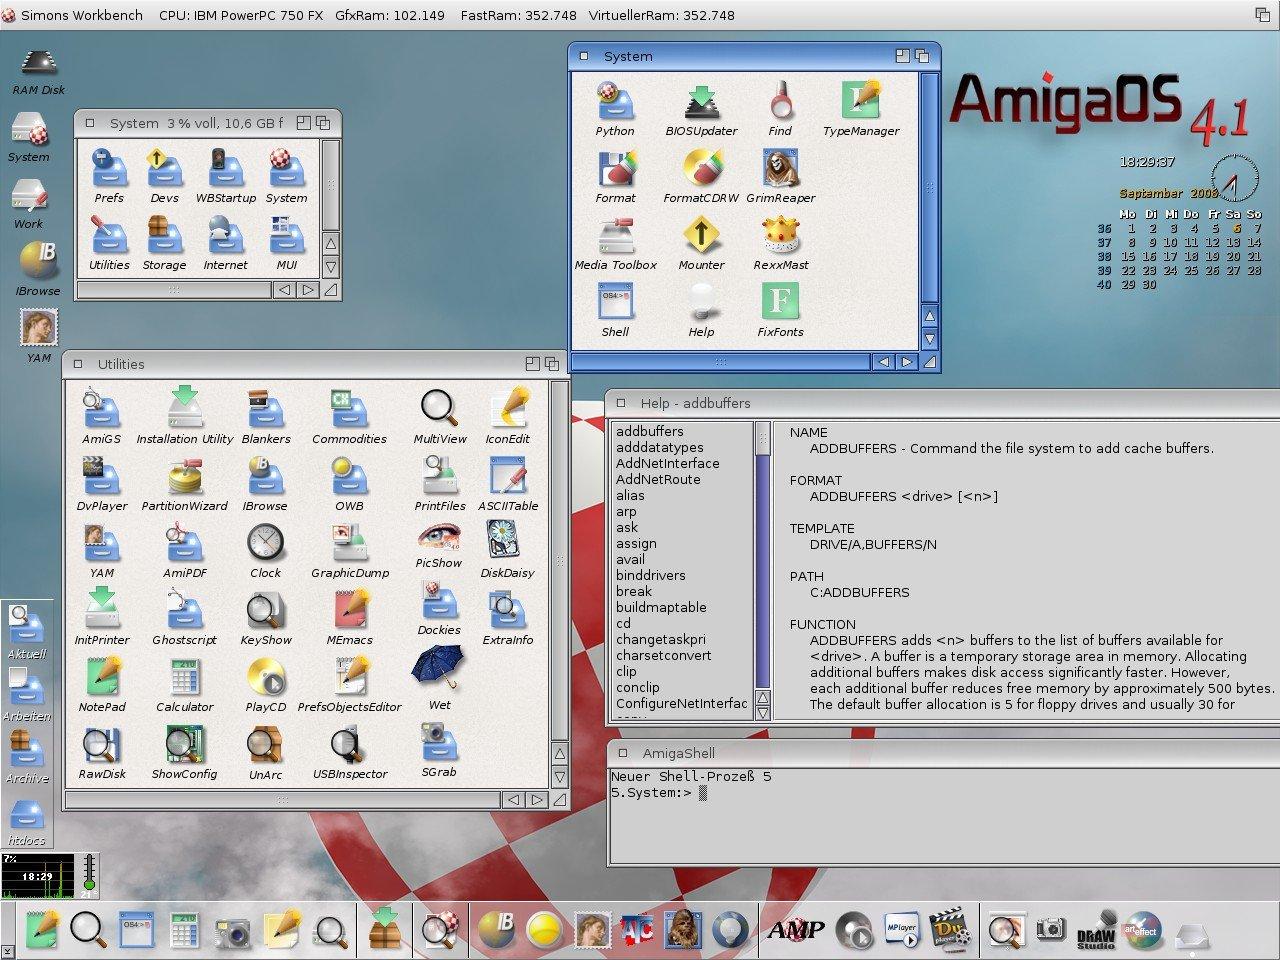 My first AmigaOS 4.1 screenshot